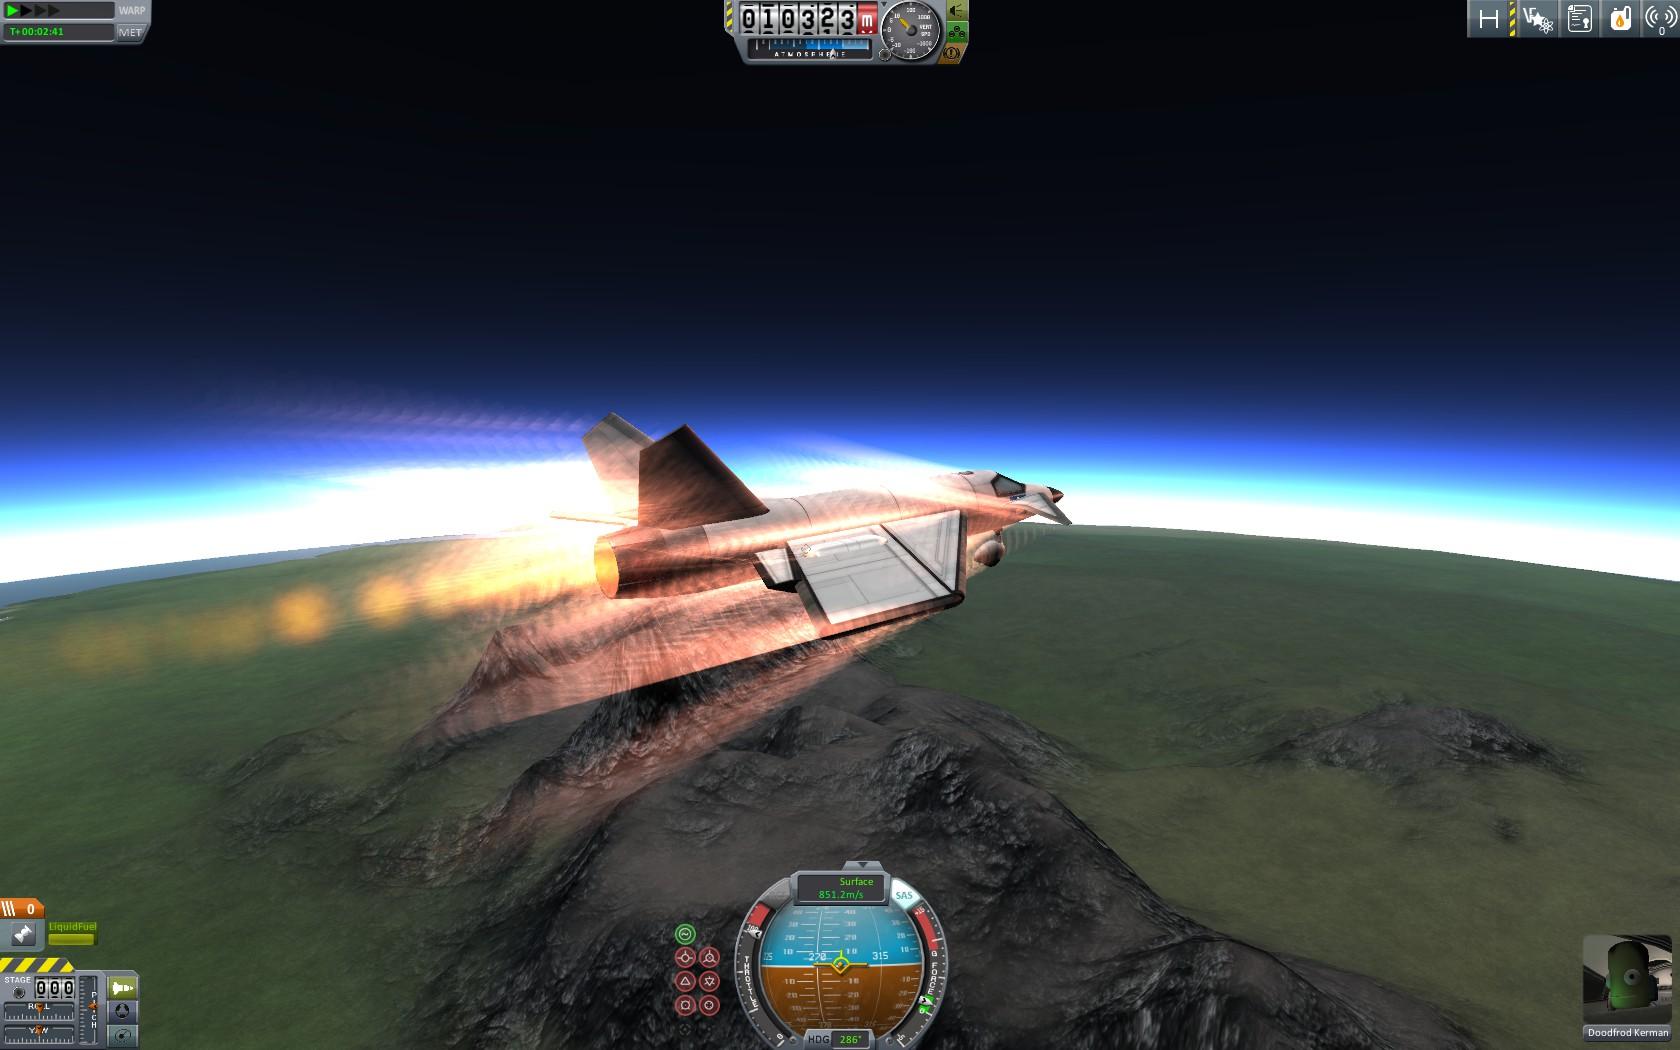 NEW PATCH FOR KERBAL SPACE PROGRAM - INN